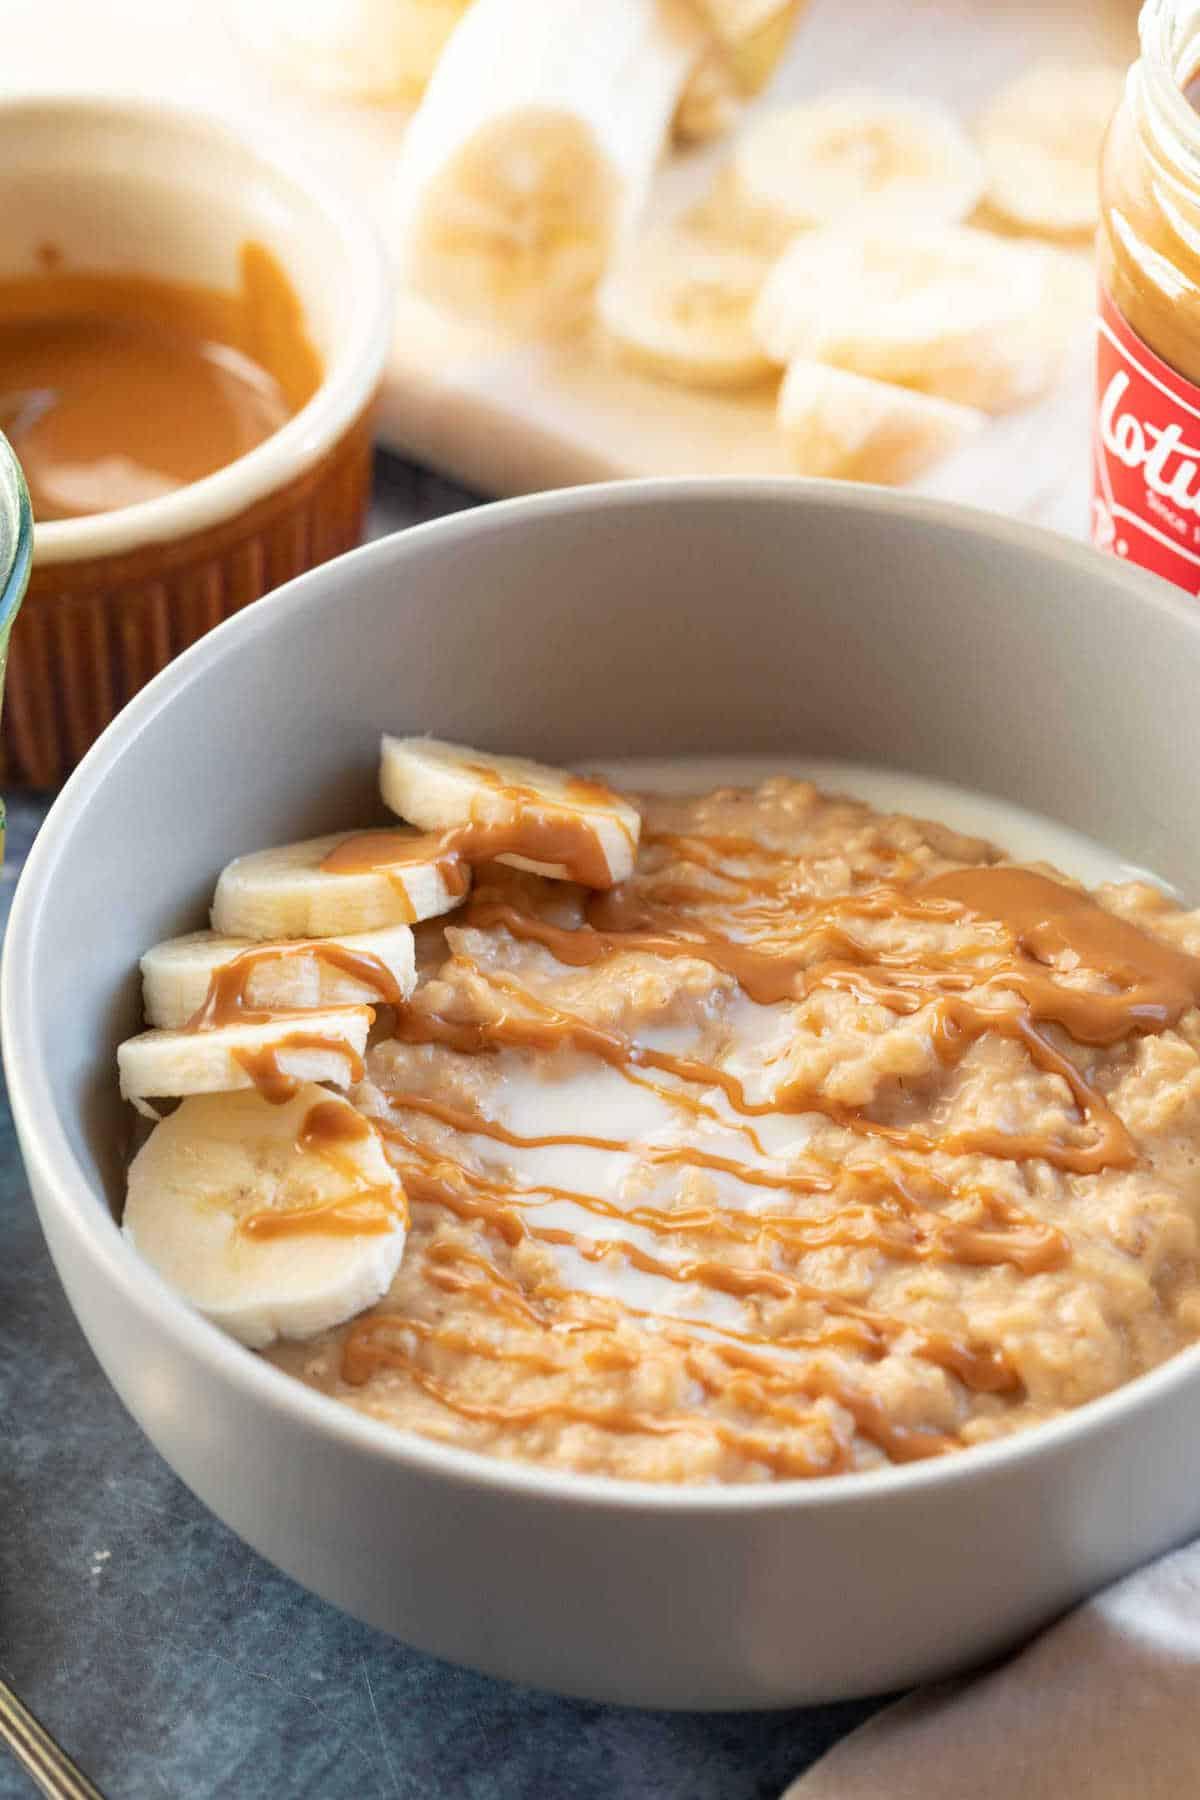 Biscoff porridge in a grey cereal bowl.